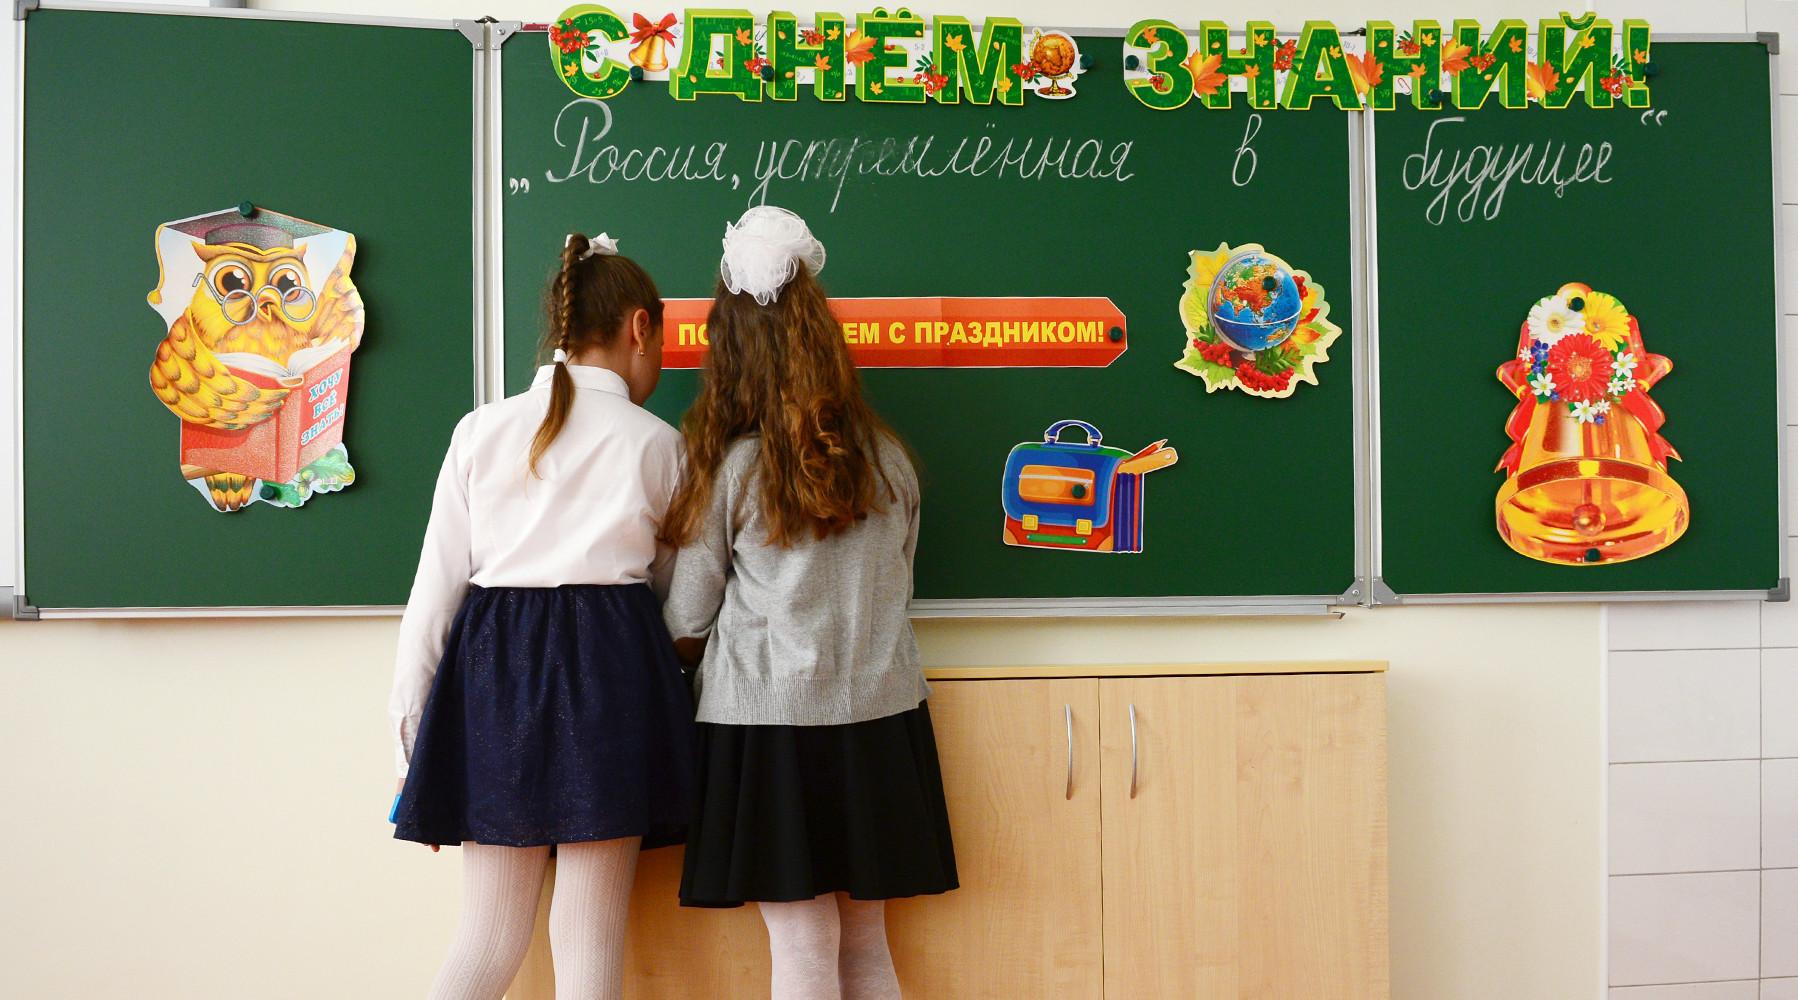 cdni.rt.com/russian/images/2017.09/original/59cb1b41370f2c25308b4567.jpg